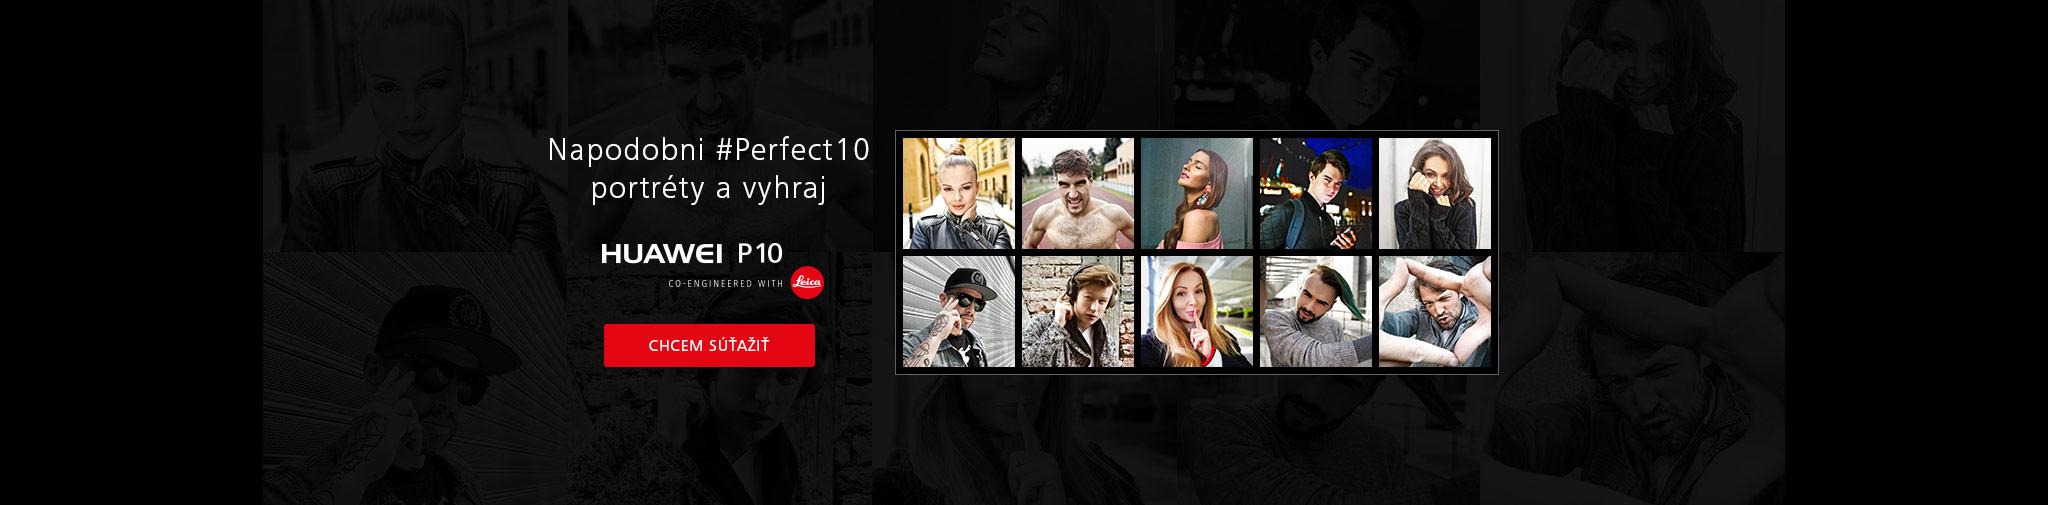 #Perfect10